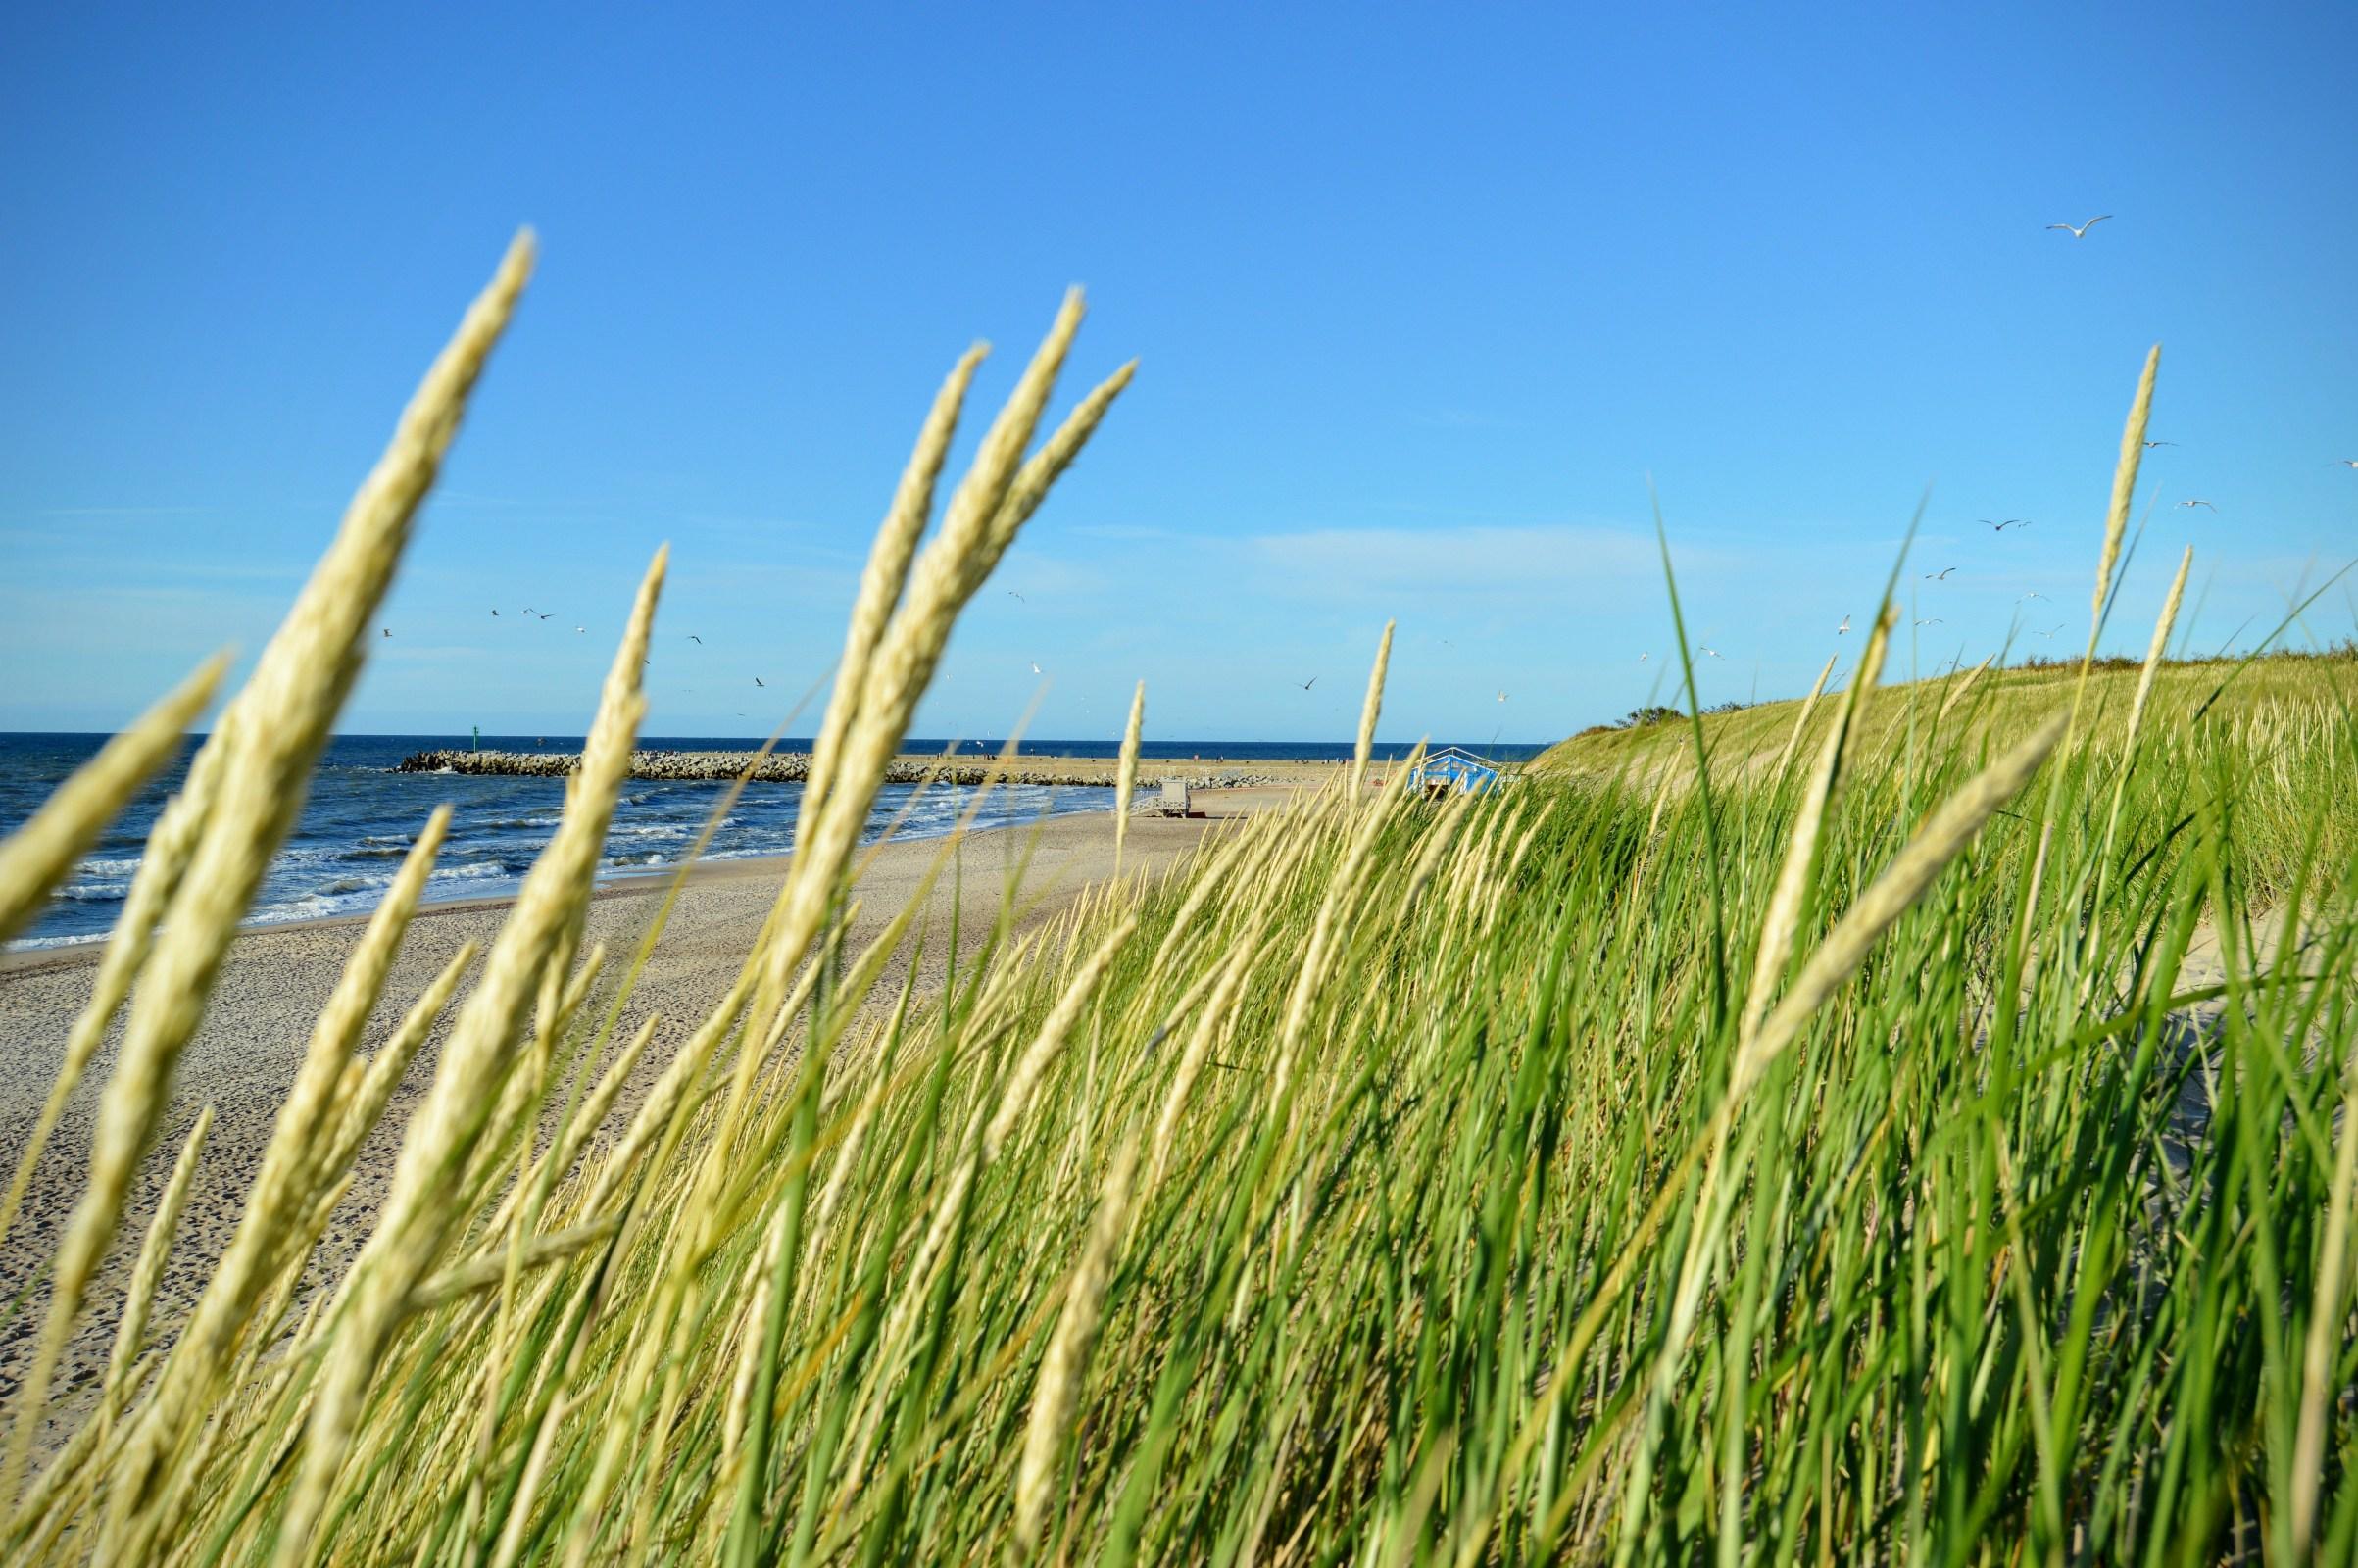 Green grass close-up on a sand dune photo